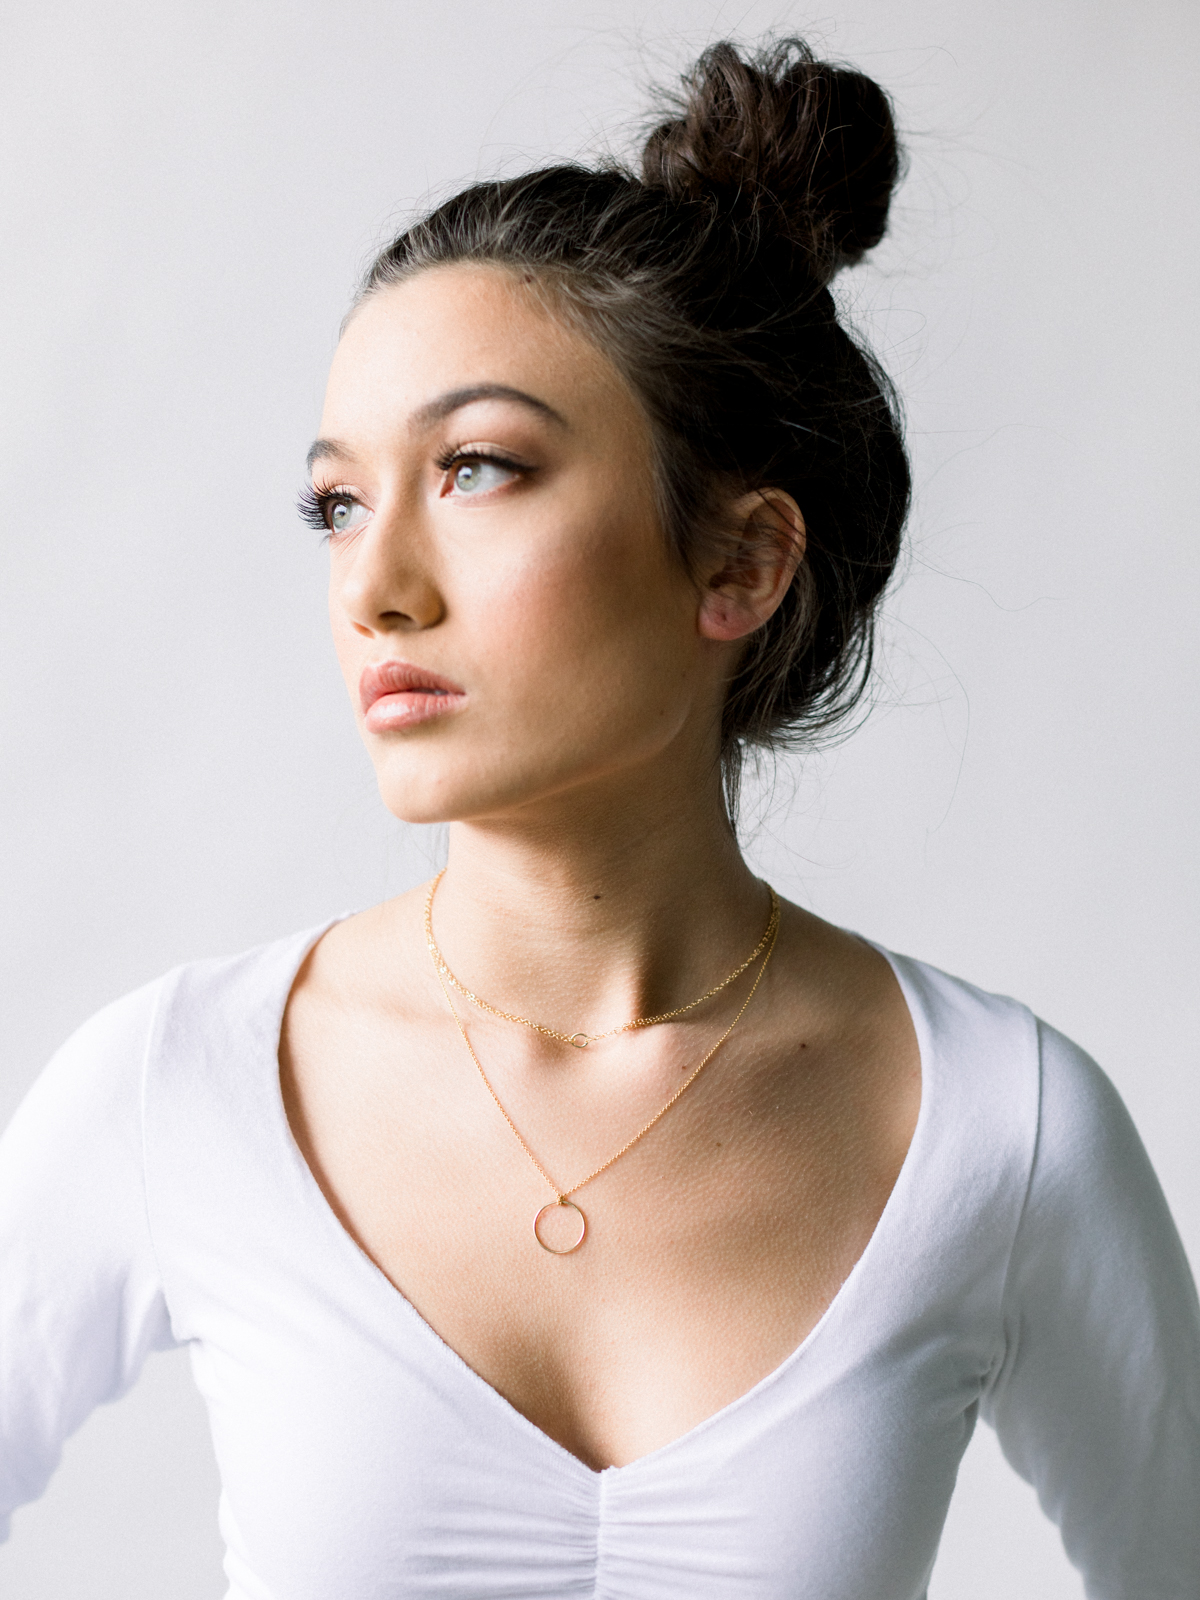 190217-0017-Rachelle-Celine-Handmade-Jewelry-DC-Elisenda-Llinares